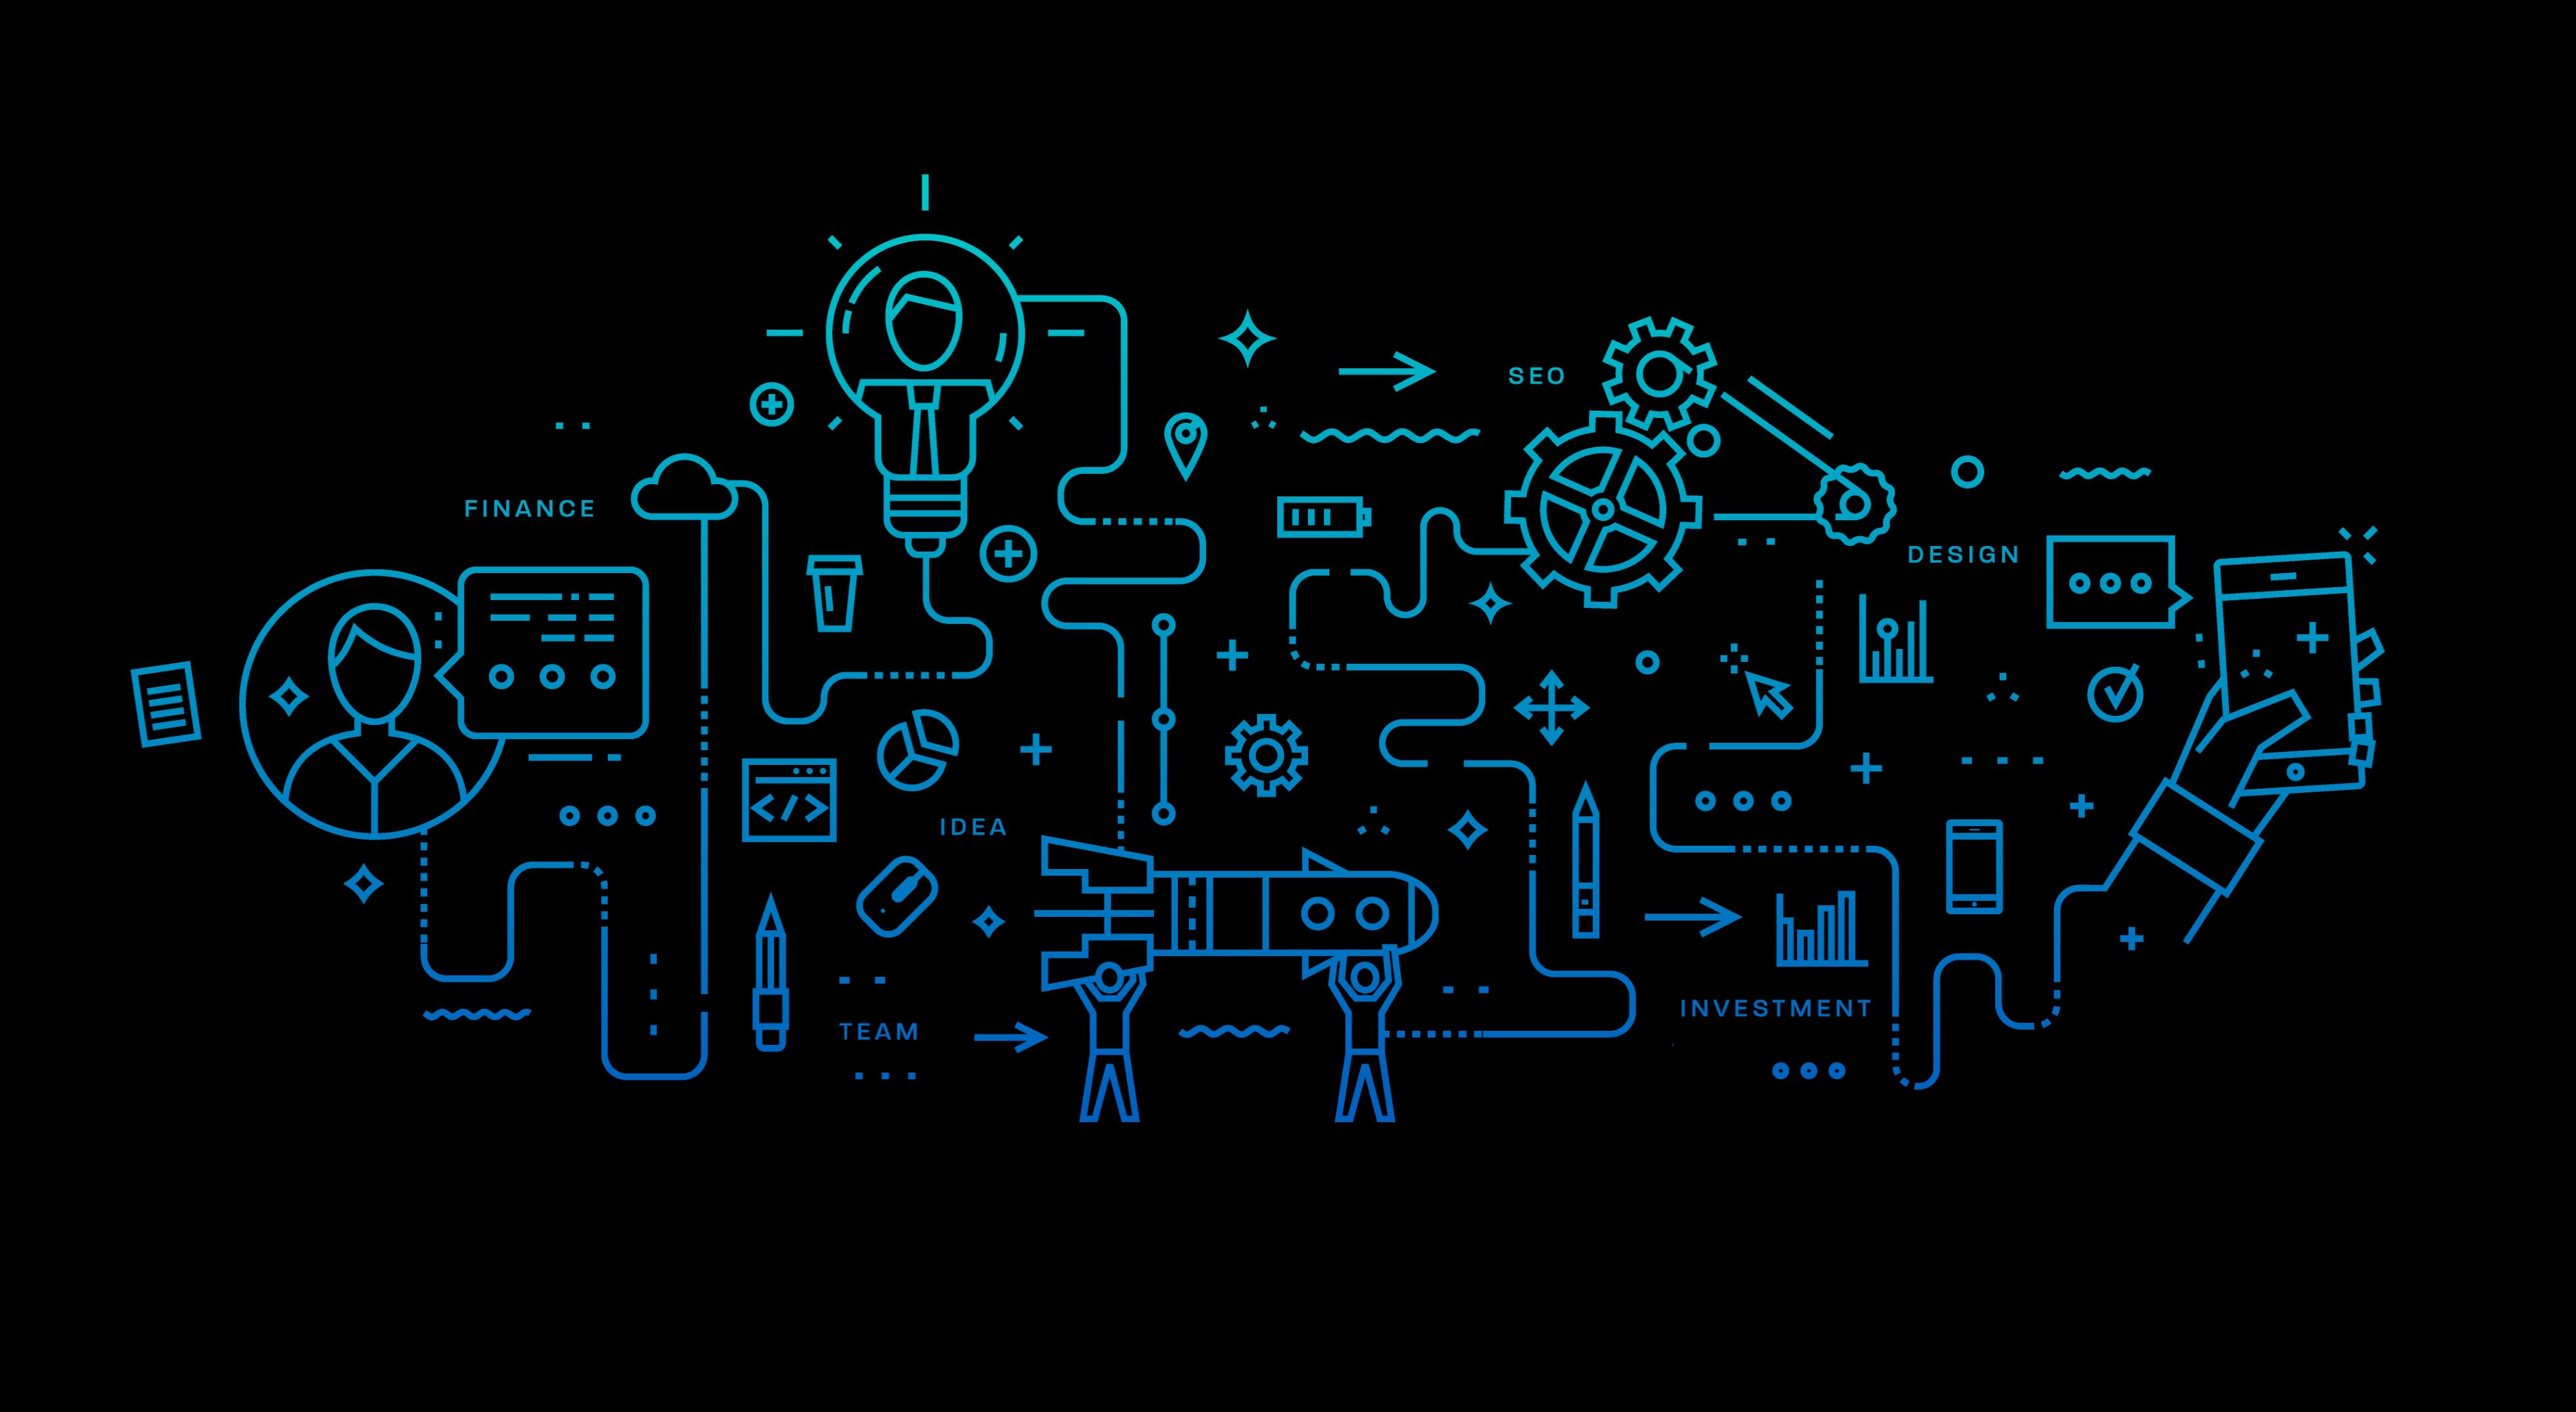 Representative technology image